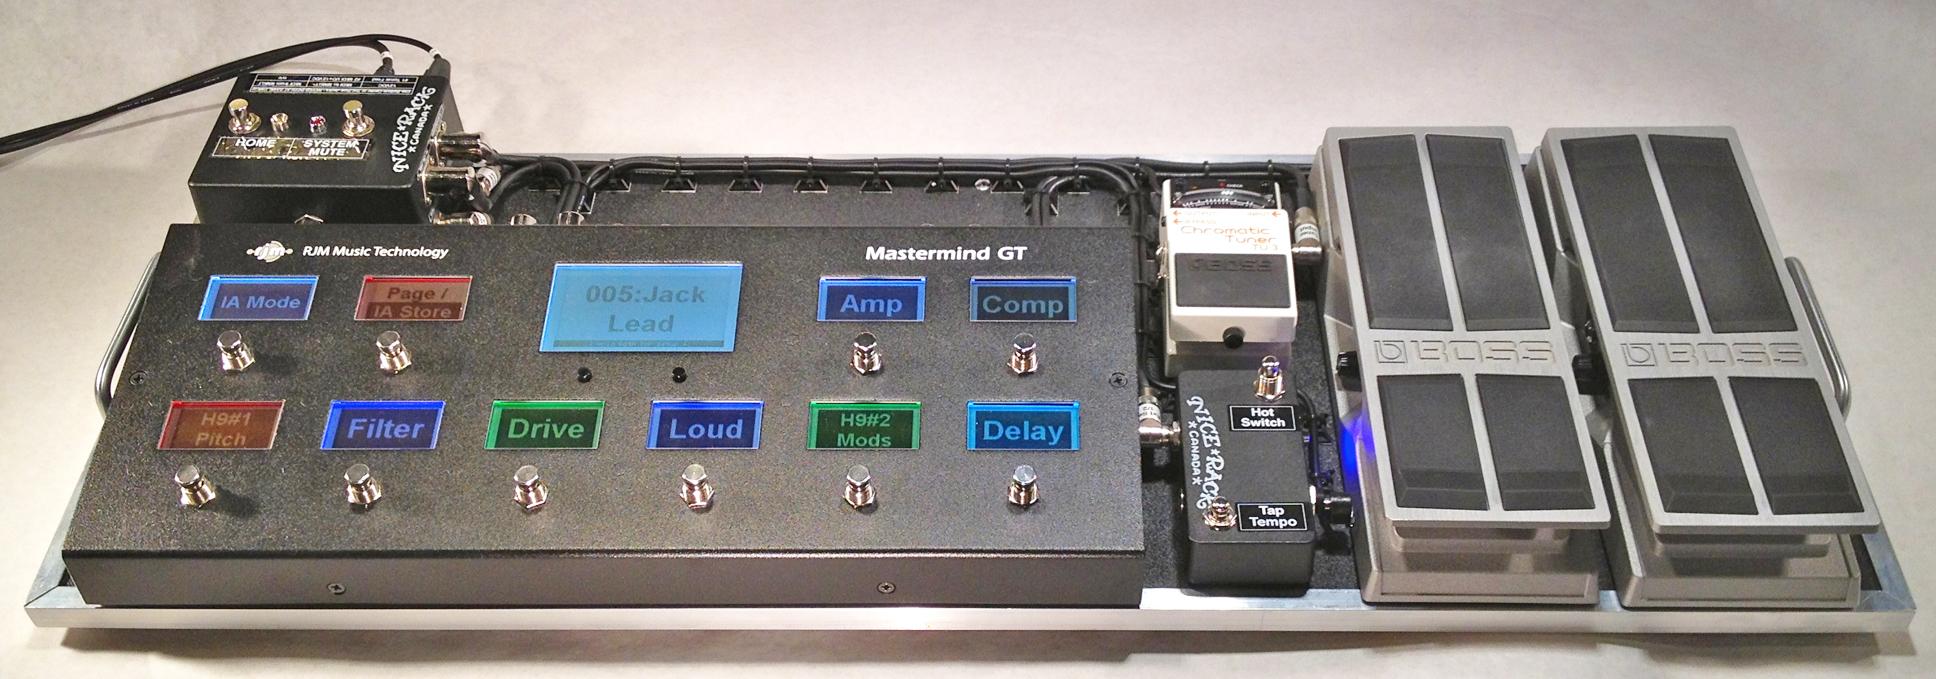 Mars Hotel Matrix Pedalboard System 01.JPG